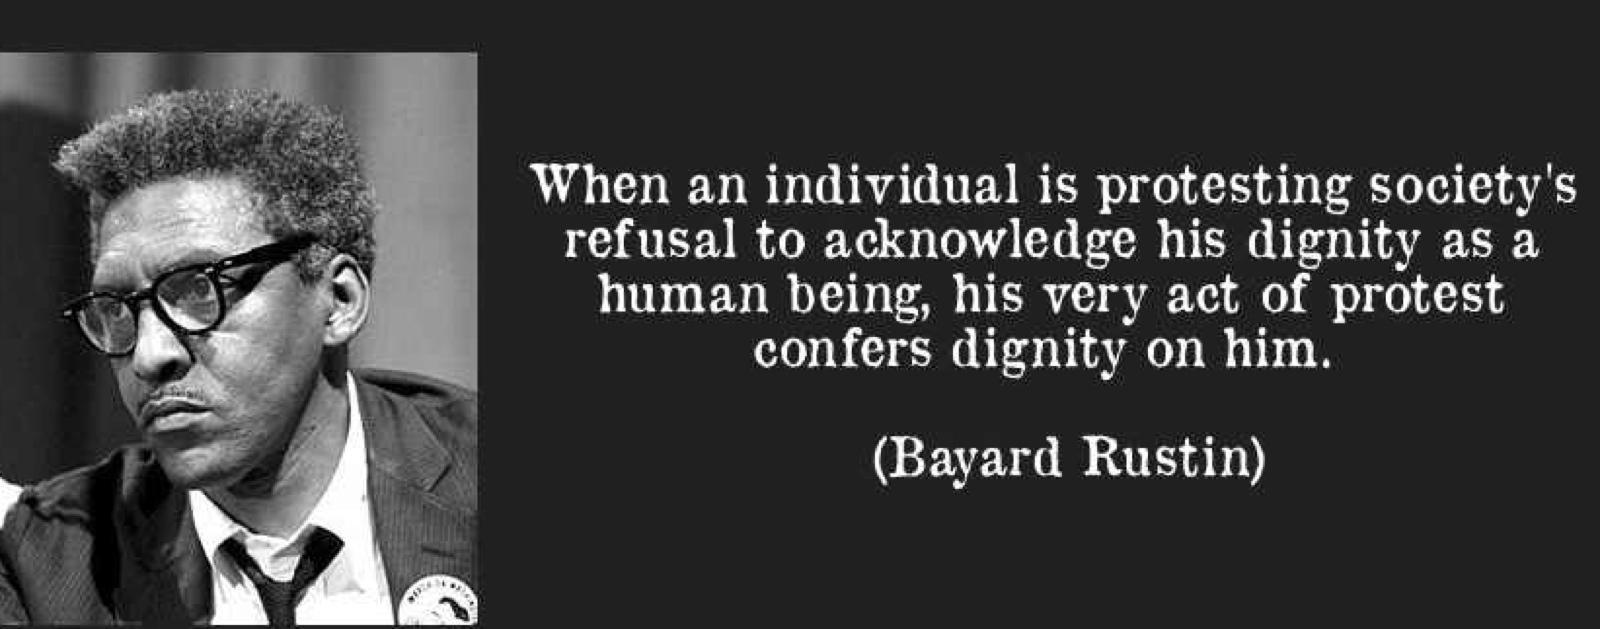 Bayard Rustin's quote #1